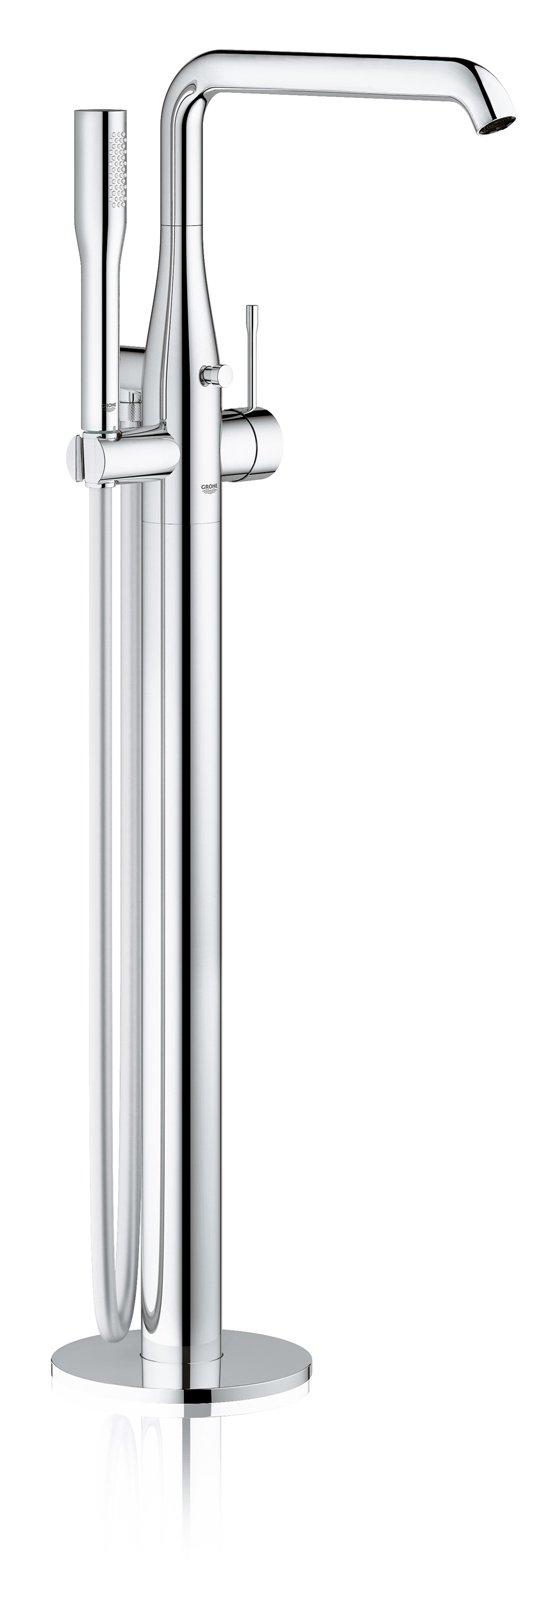 3grohe-essencenew-rubinettivasca